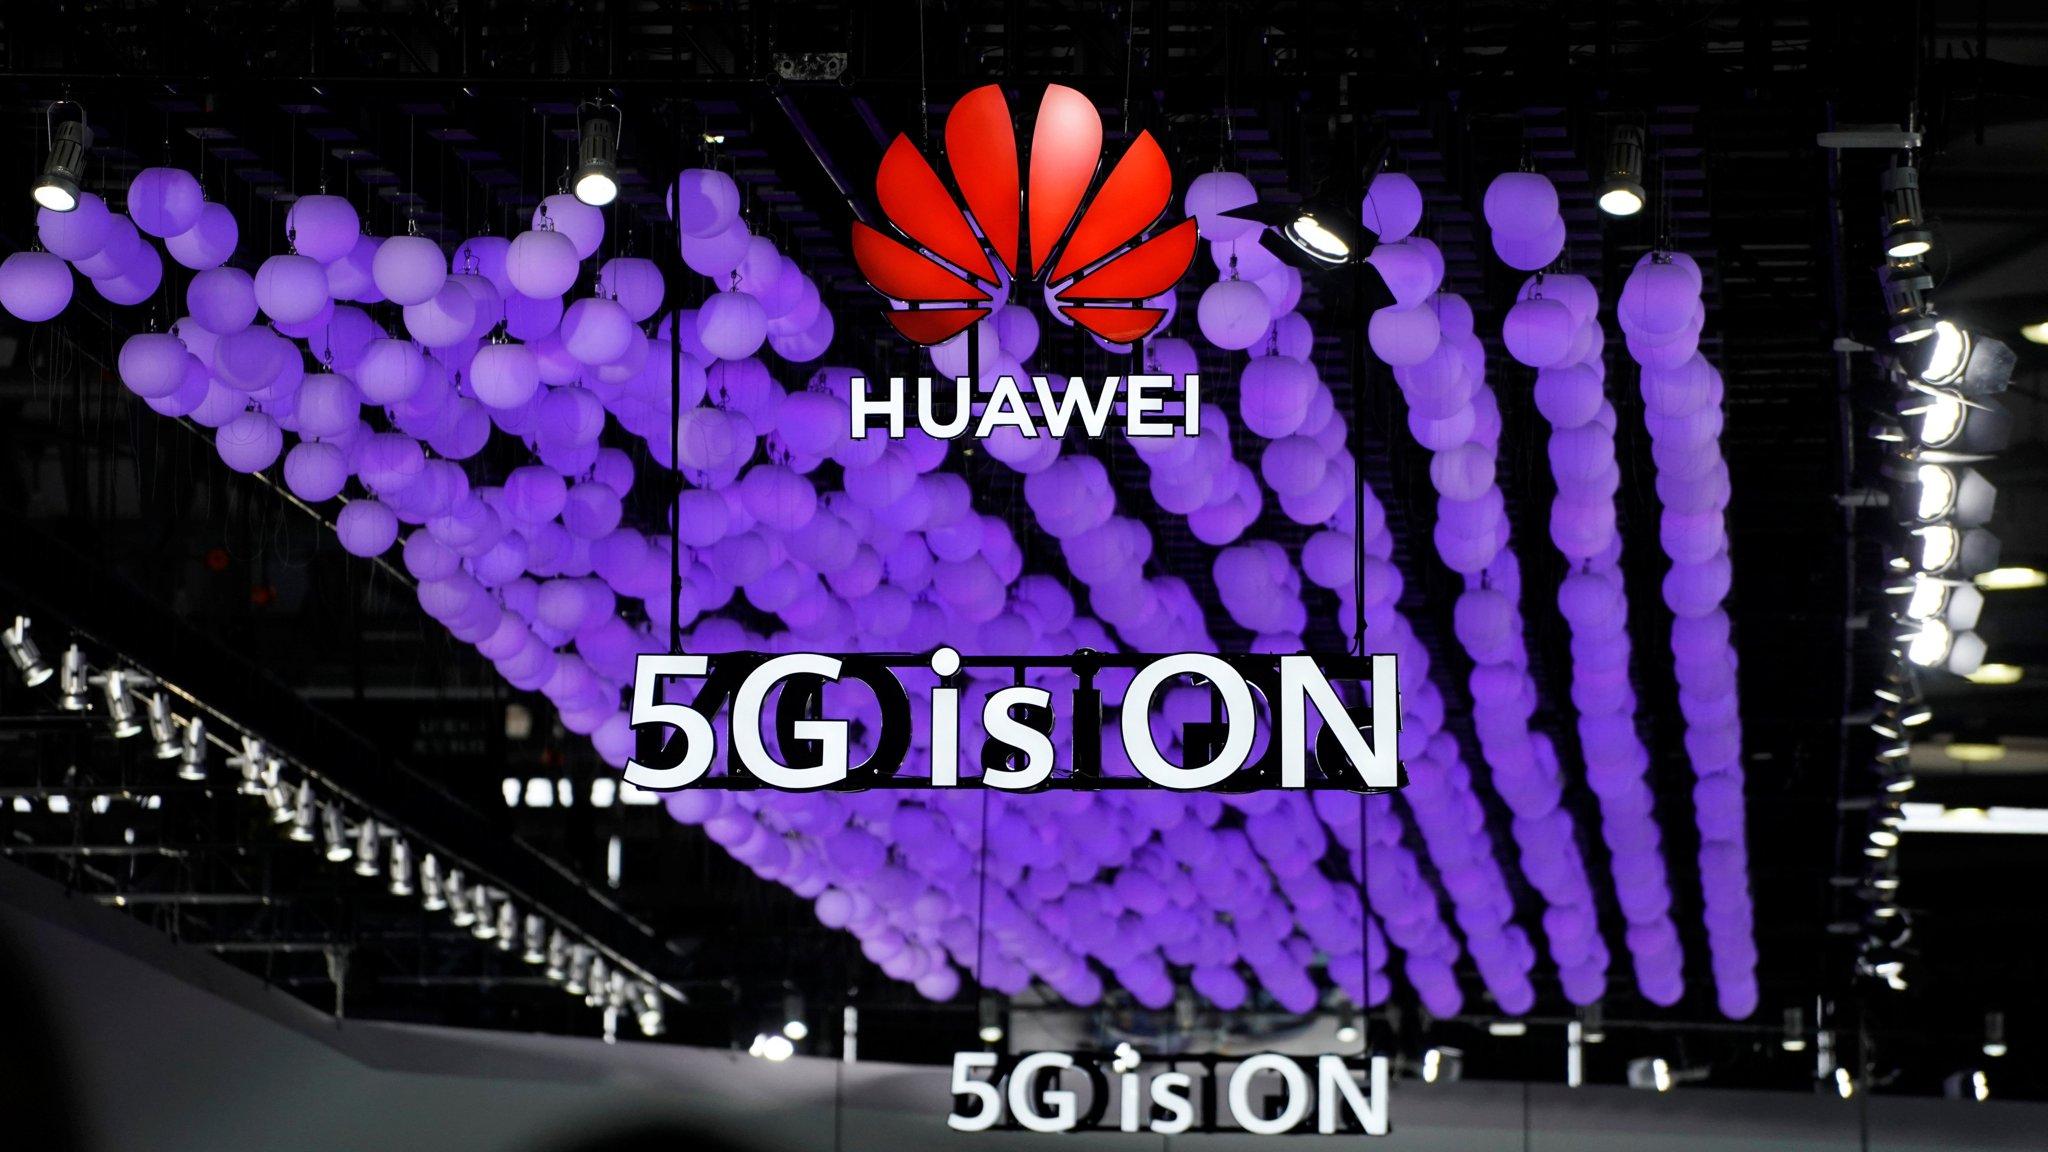 grande vente 9f47d 964e5 Huawei ban eased but tech can't relax   Financial Times